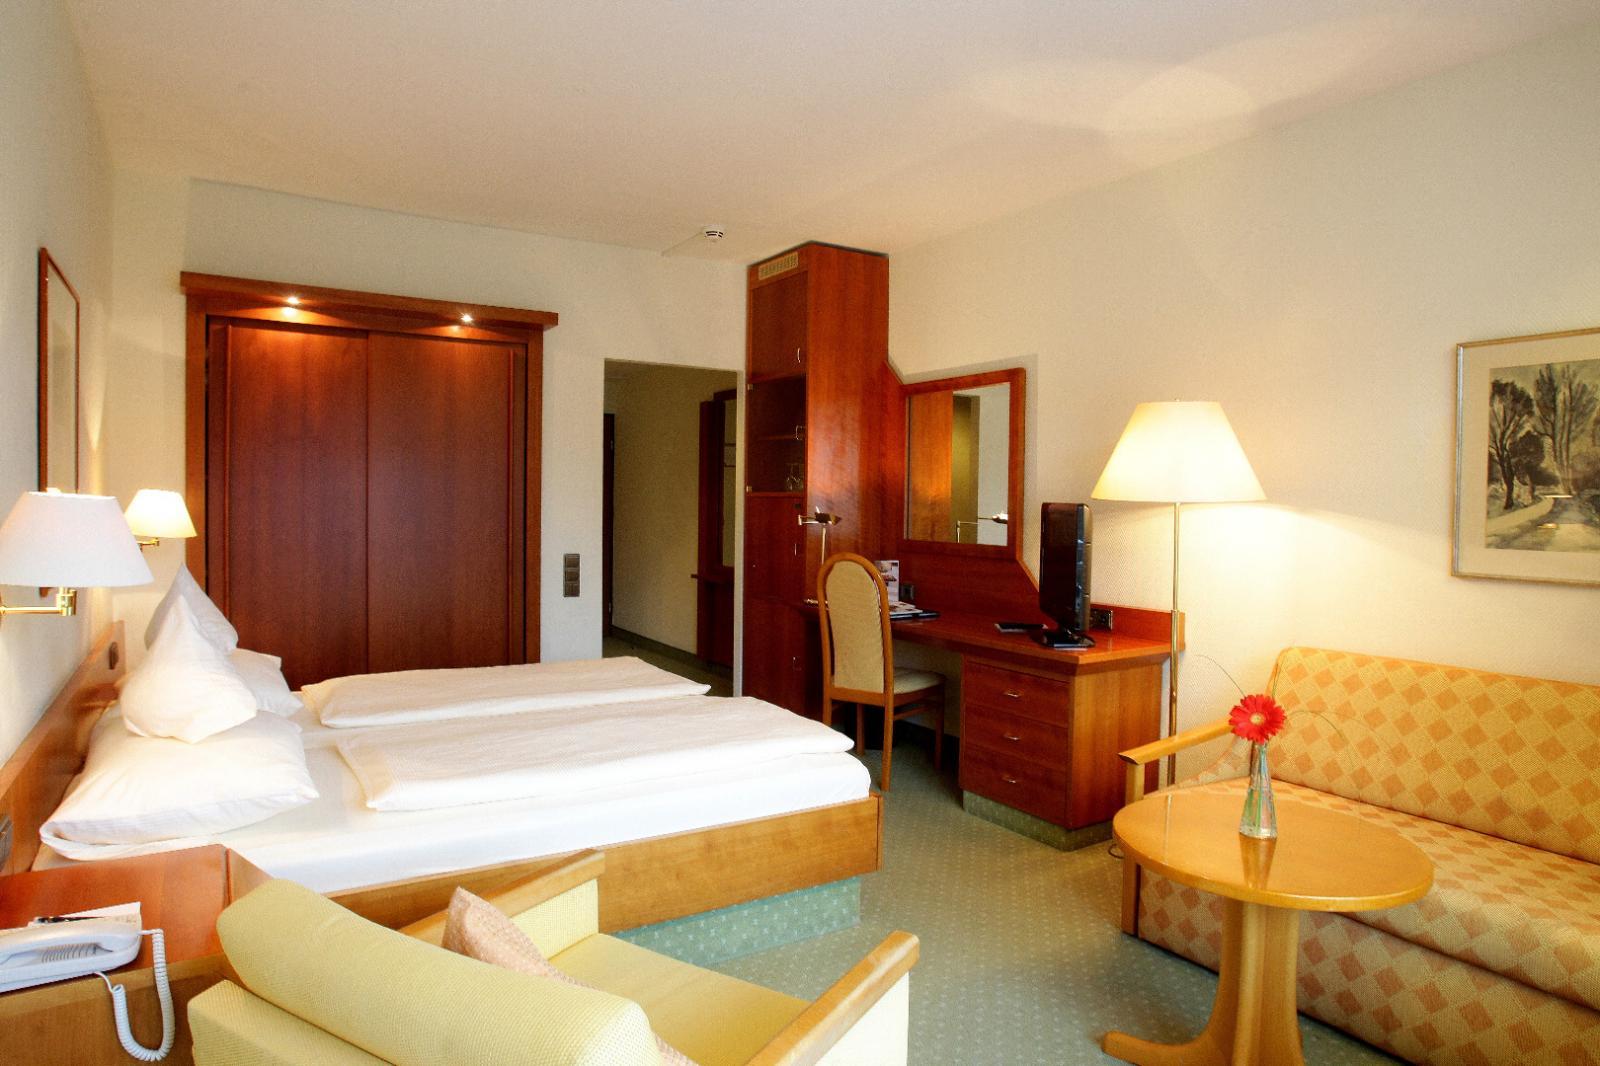 Dorint Hotel Bitburg Am See